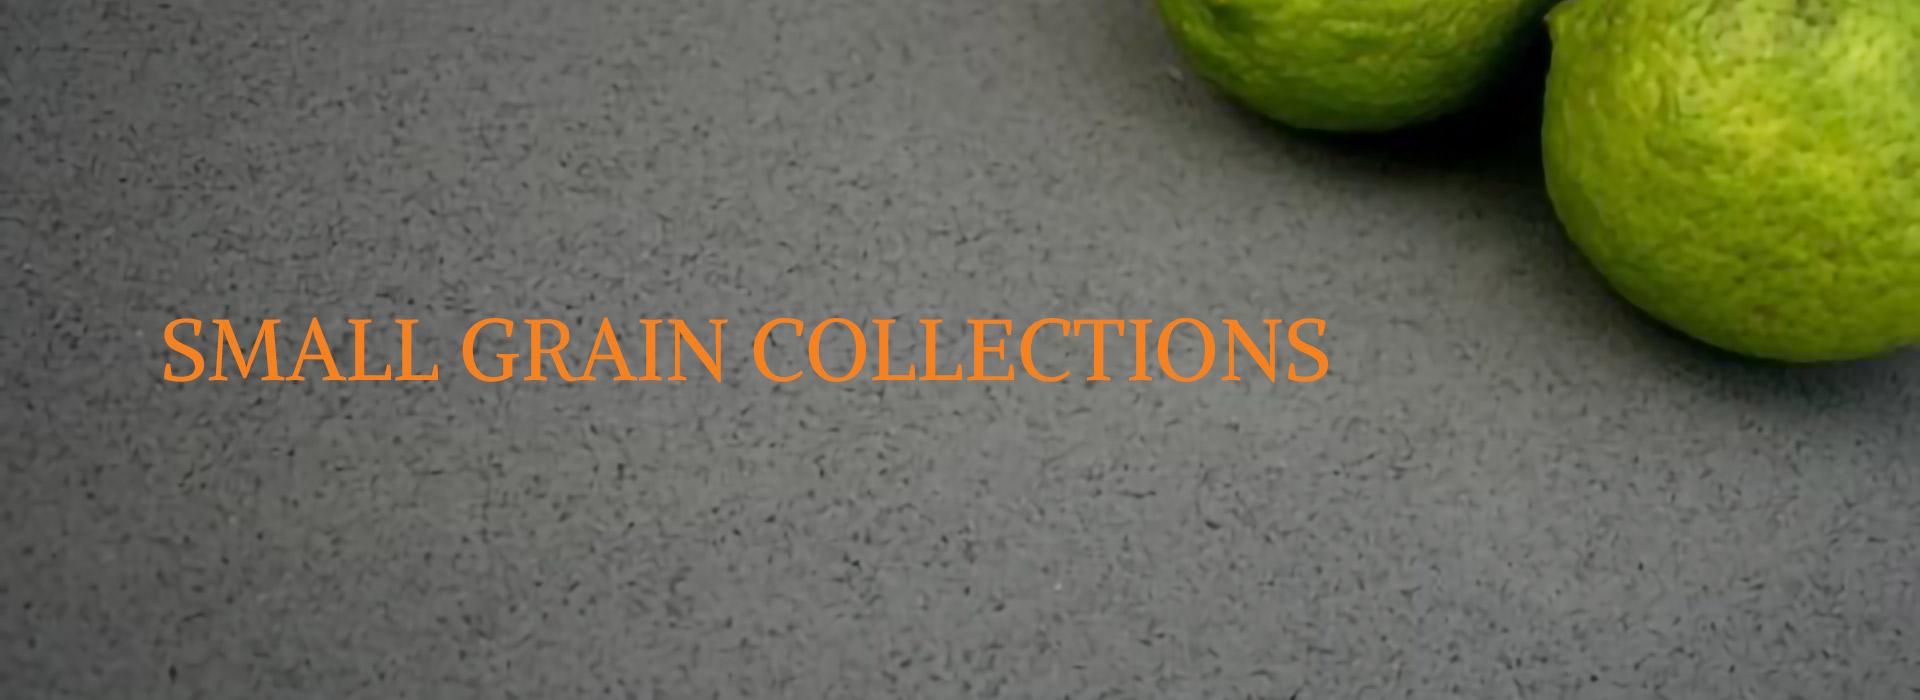 Small Grain Collection